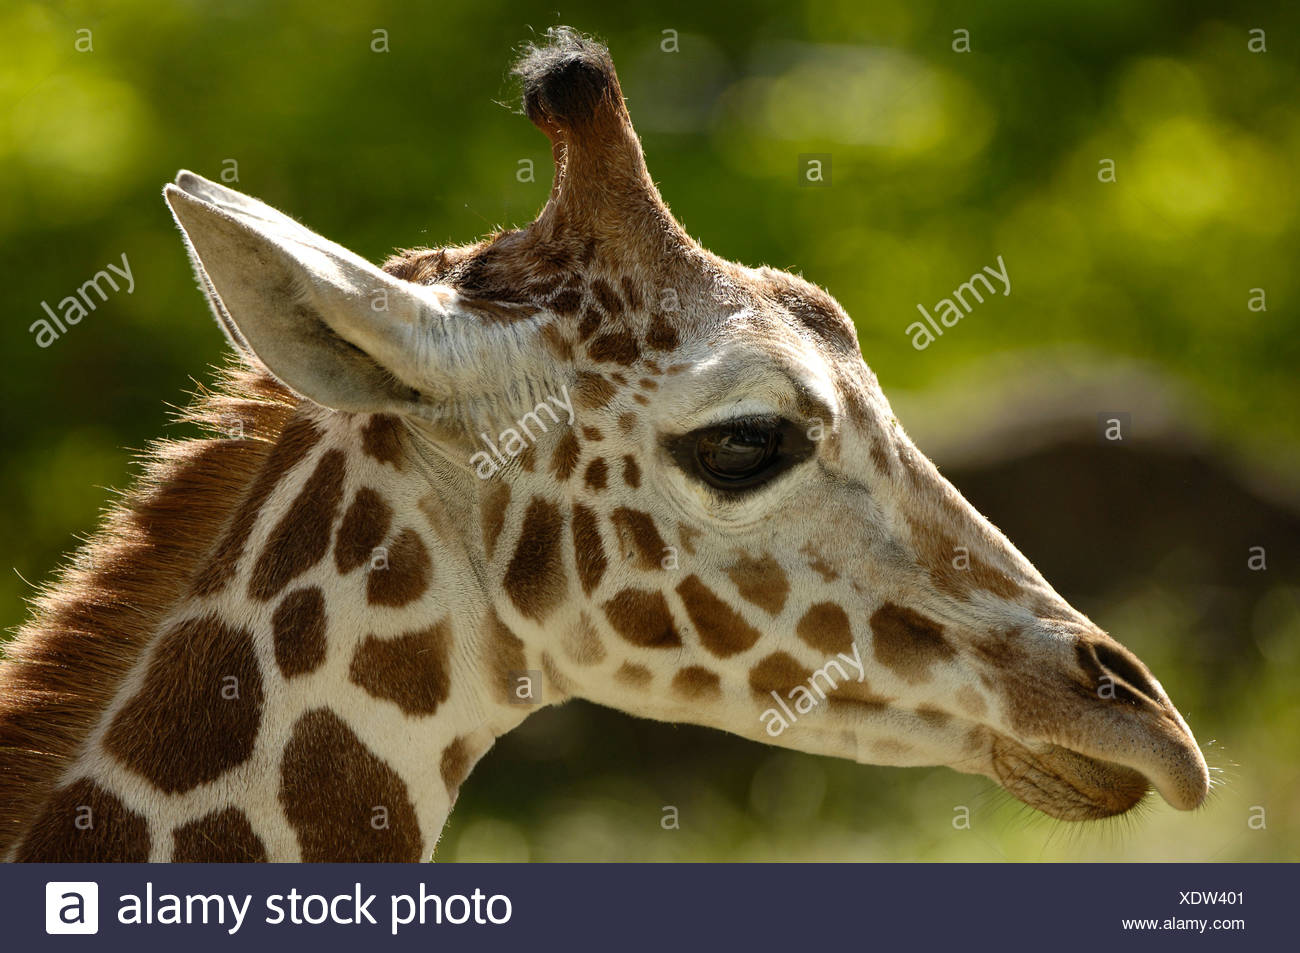 Ou somaliens giraffe réticulée (Giraffa camelopardalis reticulata) Banque D'Images